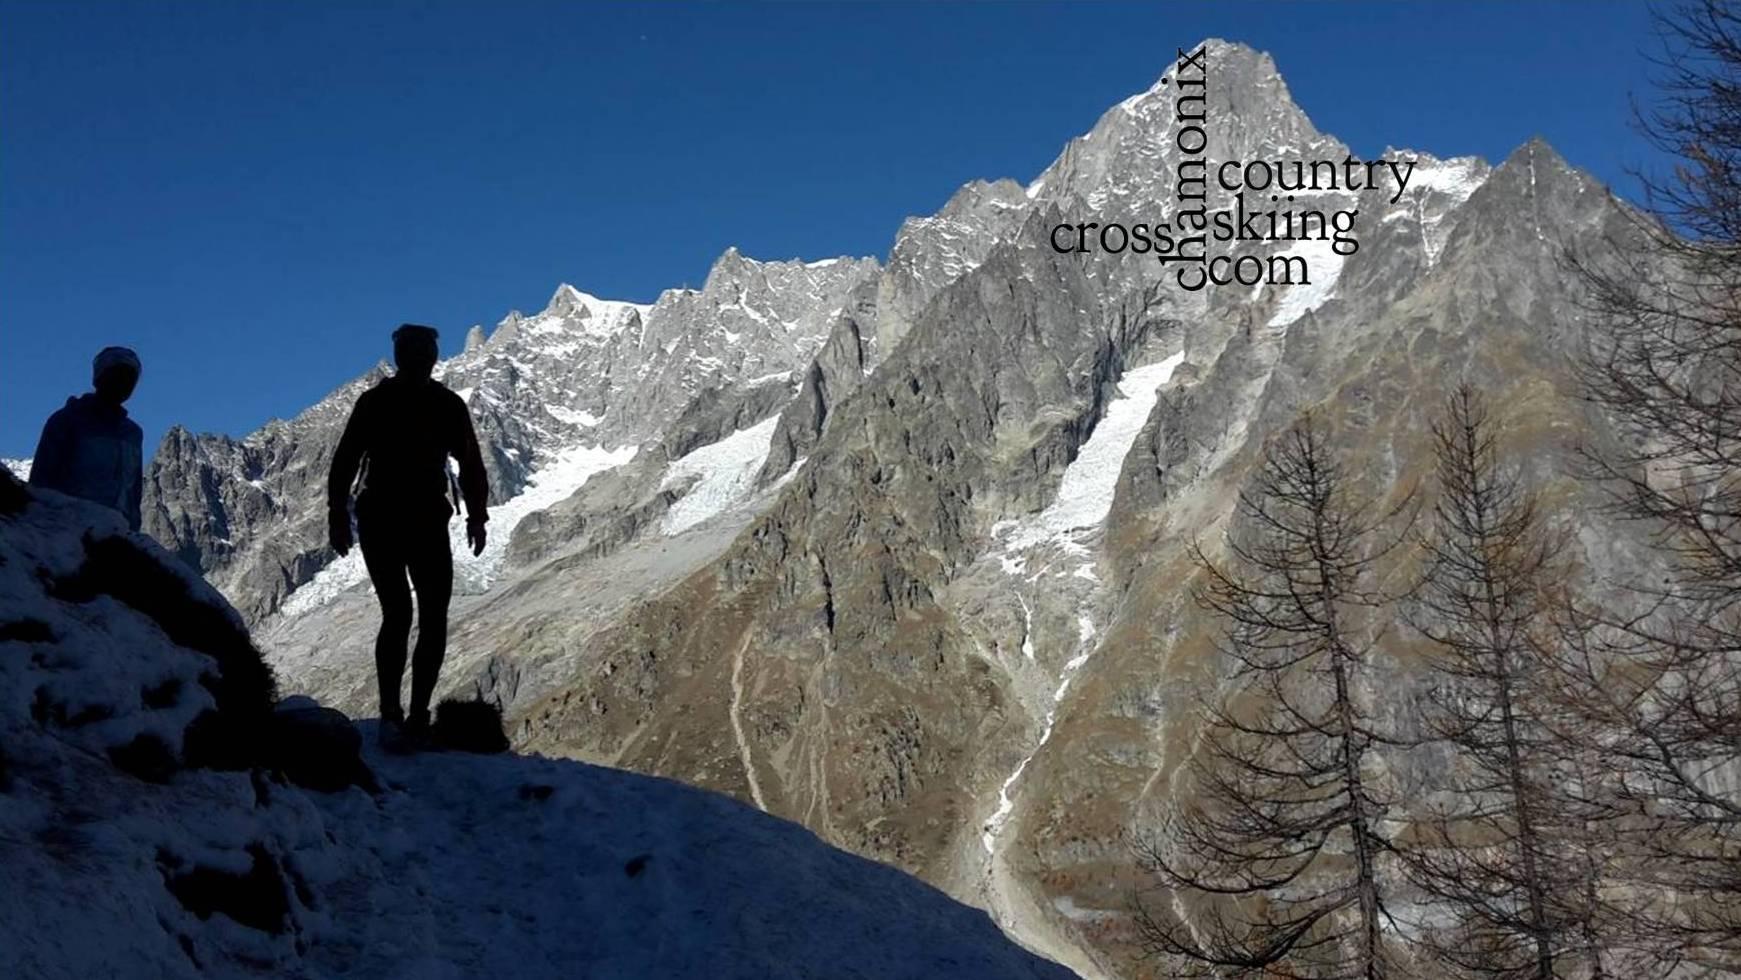 Sortie trail chamonix-cross-country-skiing.com